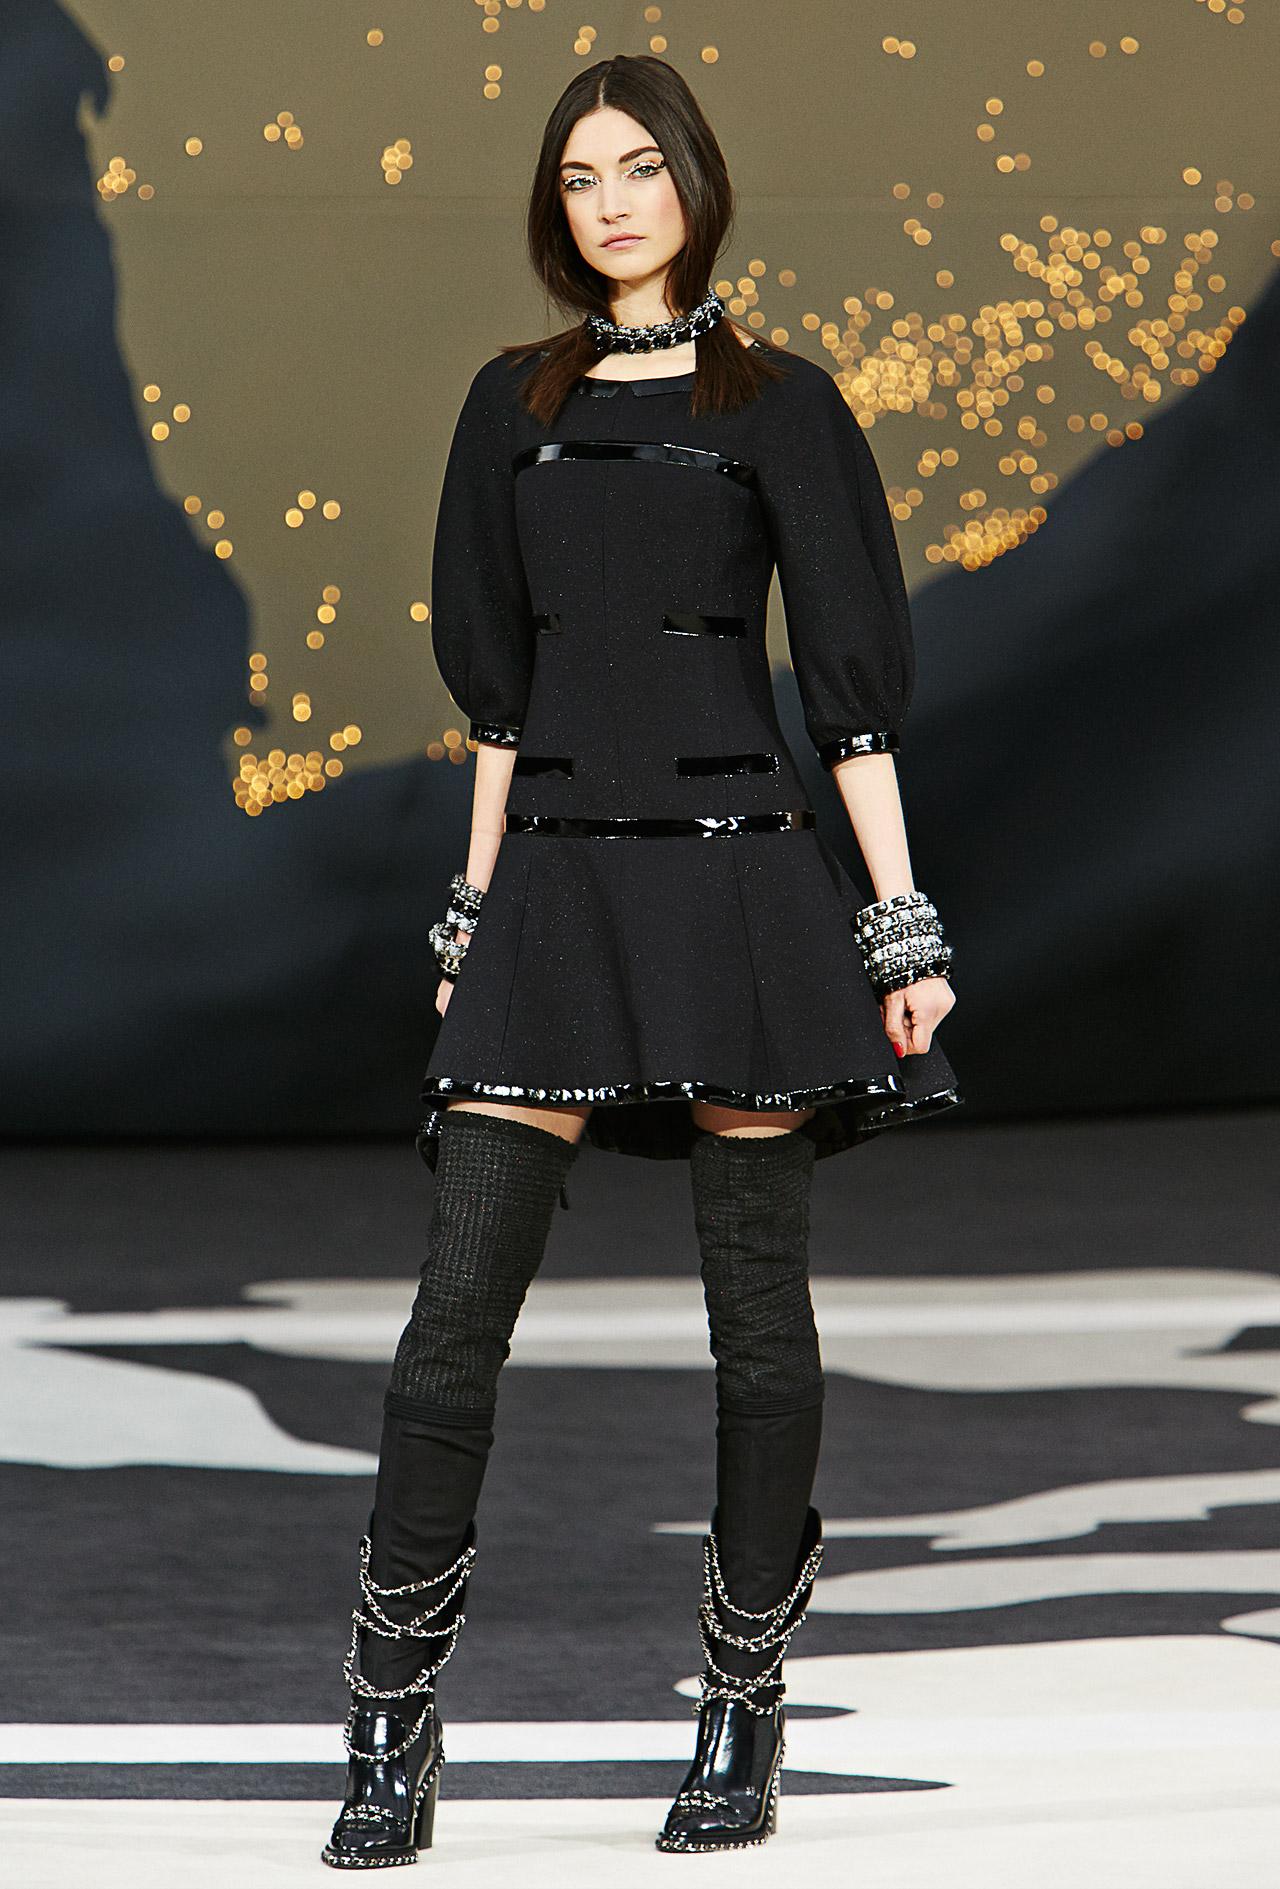 Pin by Rachel Stewart on Wear This | Trendy fashion